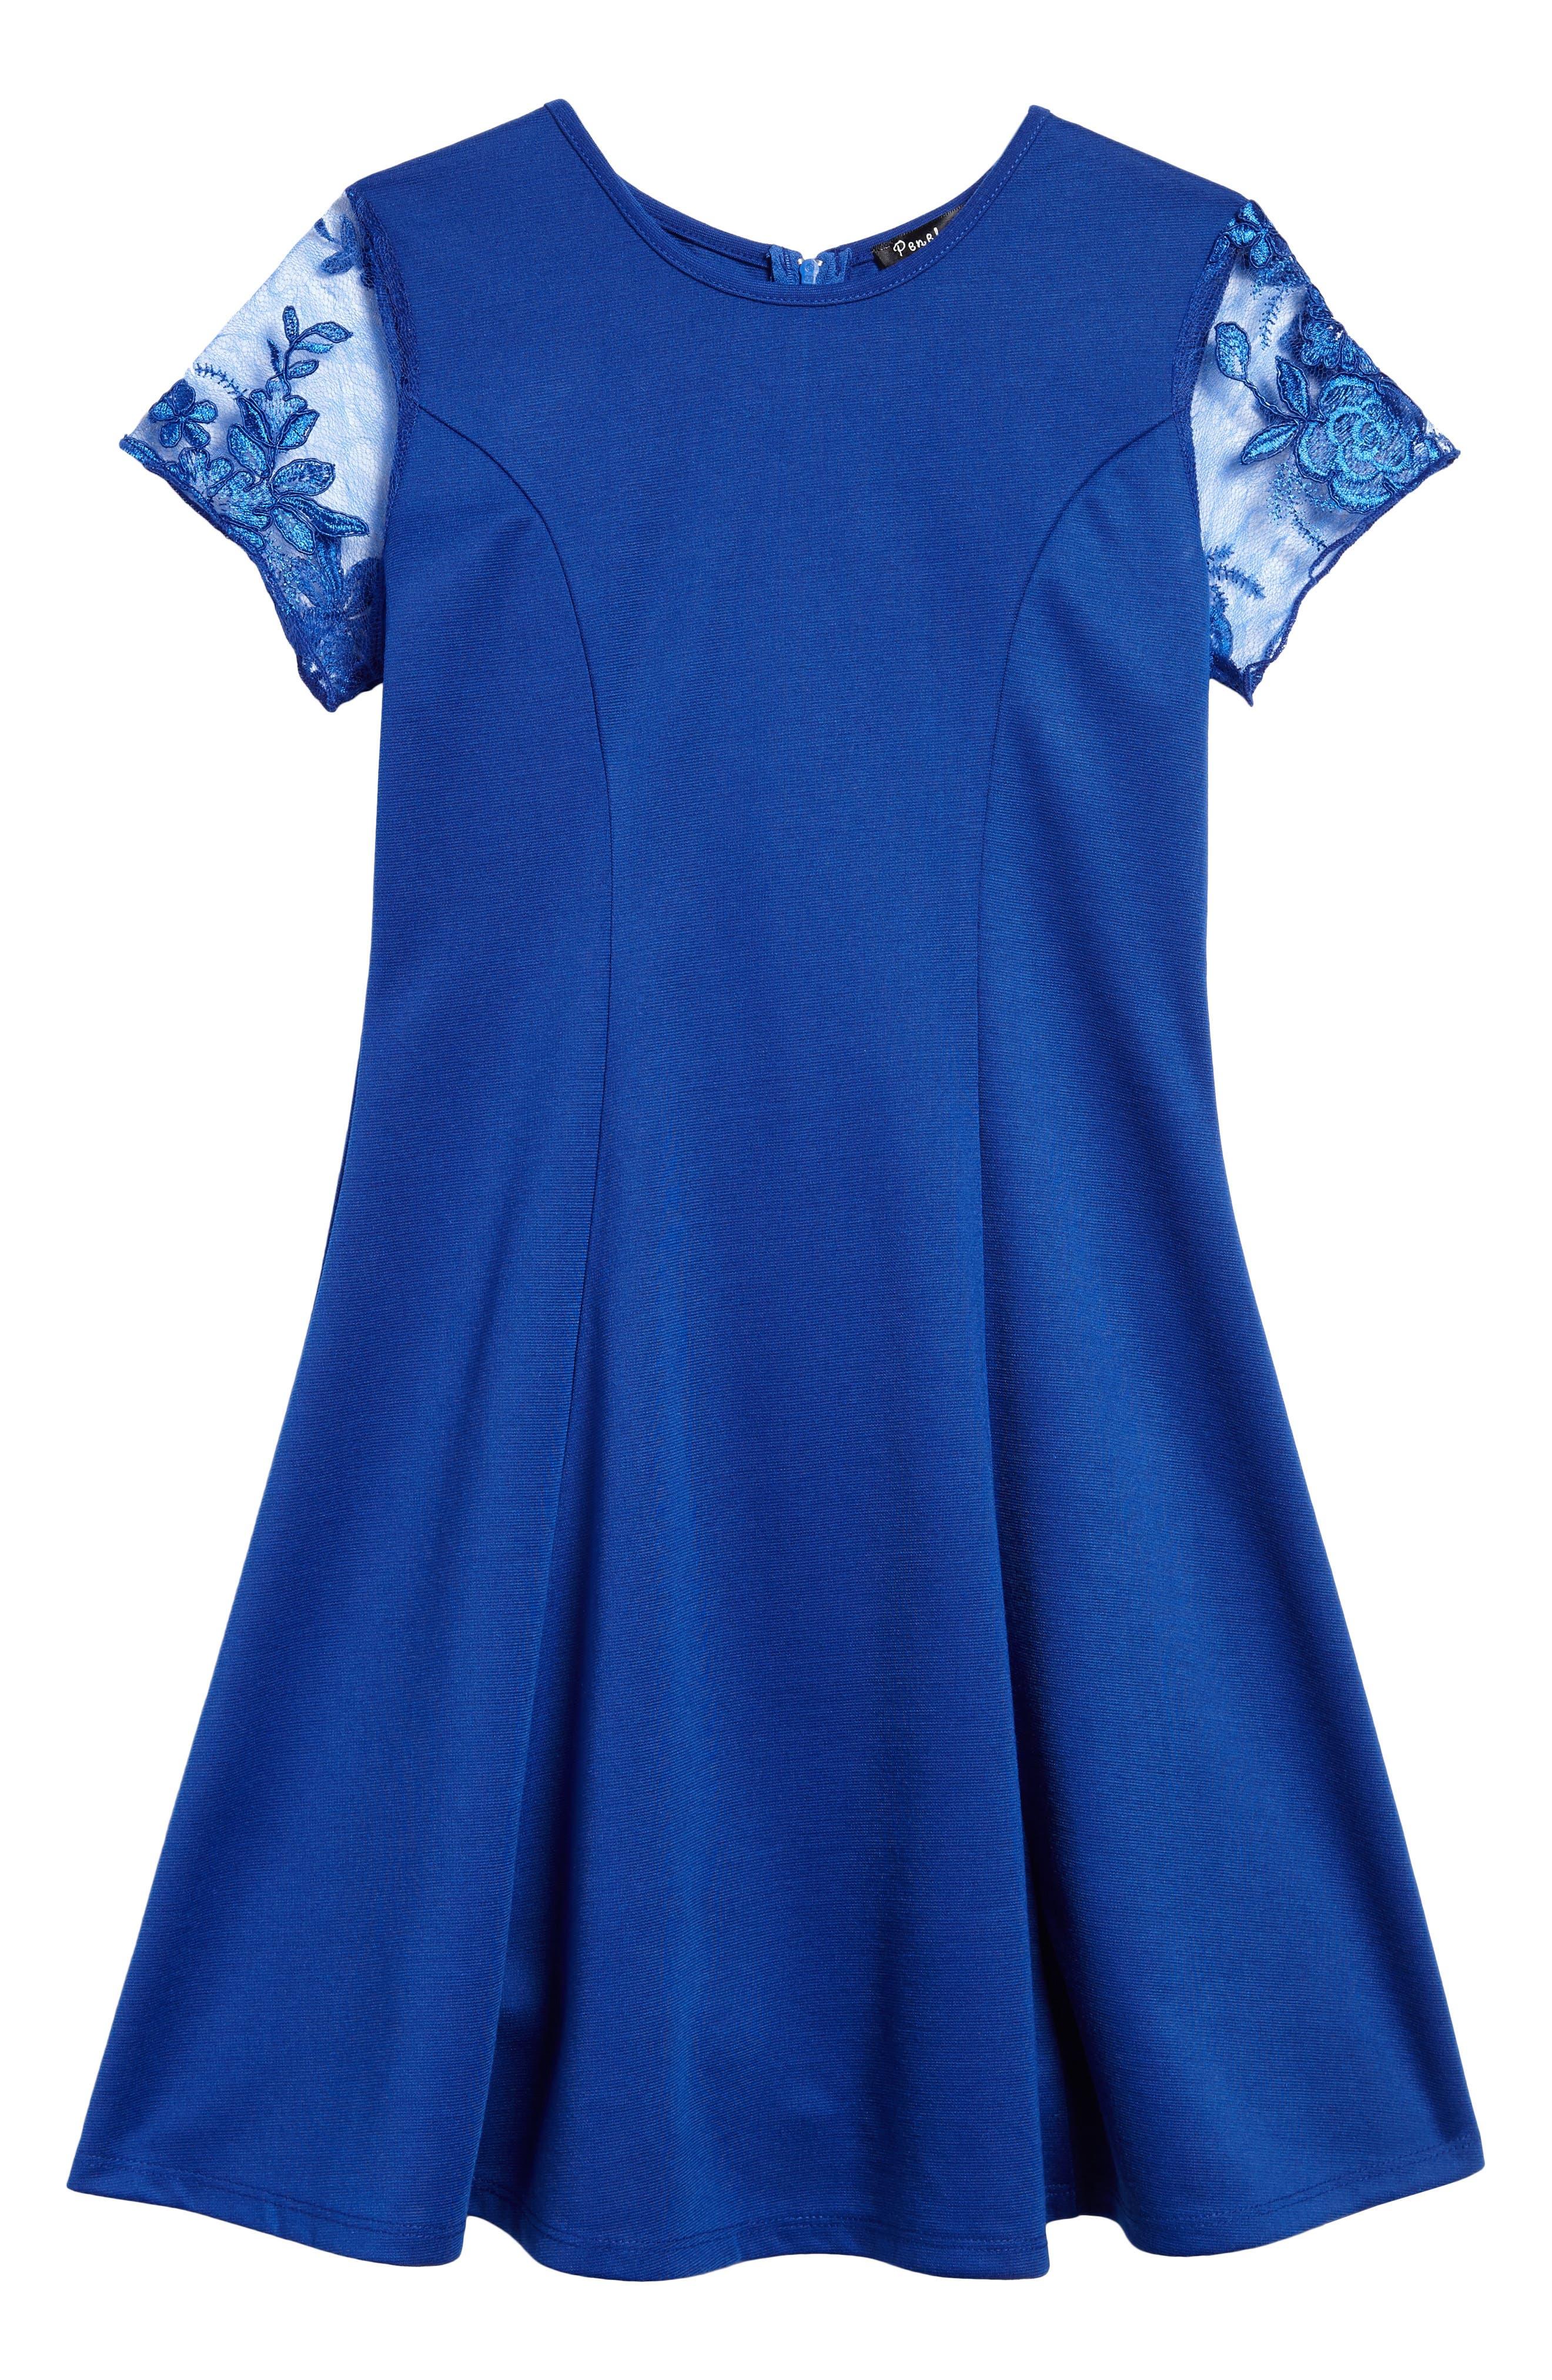 Priscilla Lace Sleeve Dress,                         Main,                         color, Royal